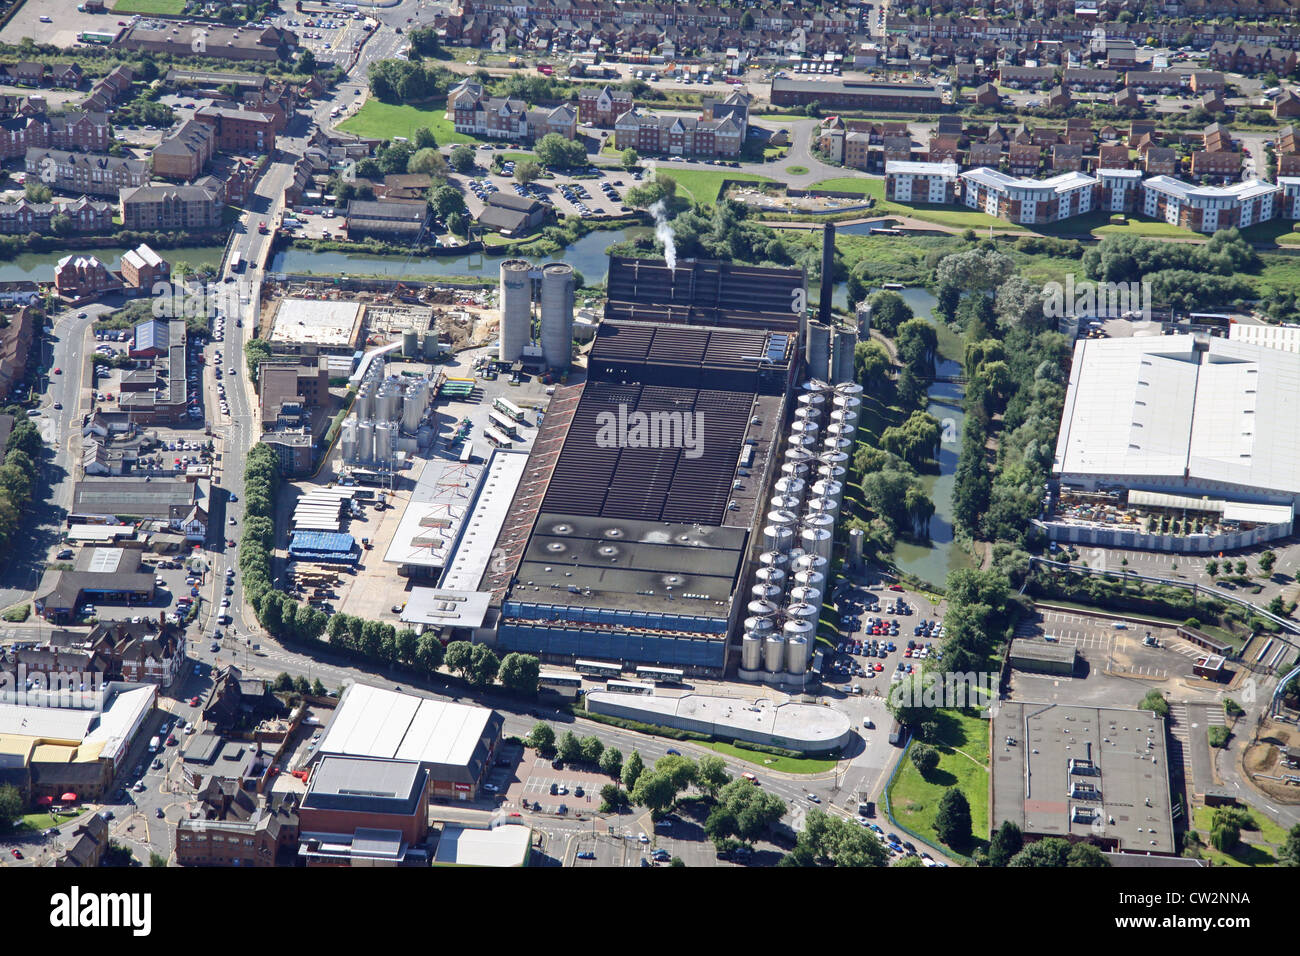 aerial view of Carlsberg brewery, Northampton - Stock Image